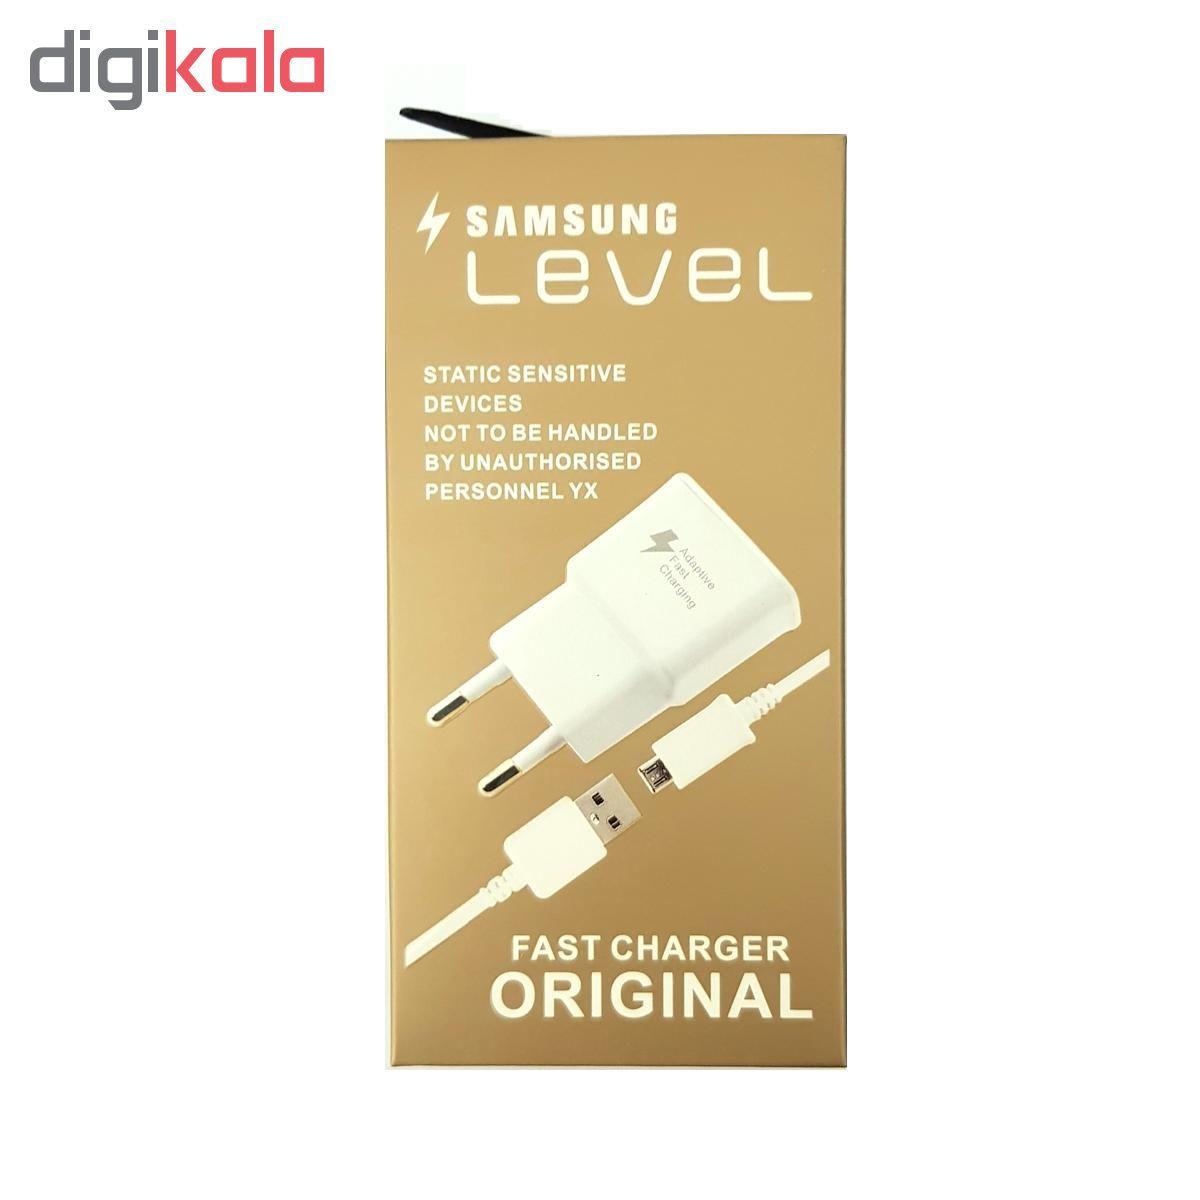 مجموعه لوازم جانبی موبایل مدل Level S6 main 1 1